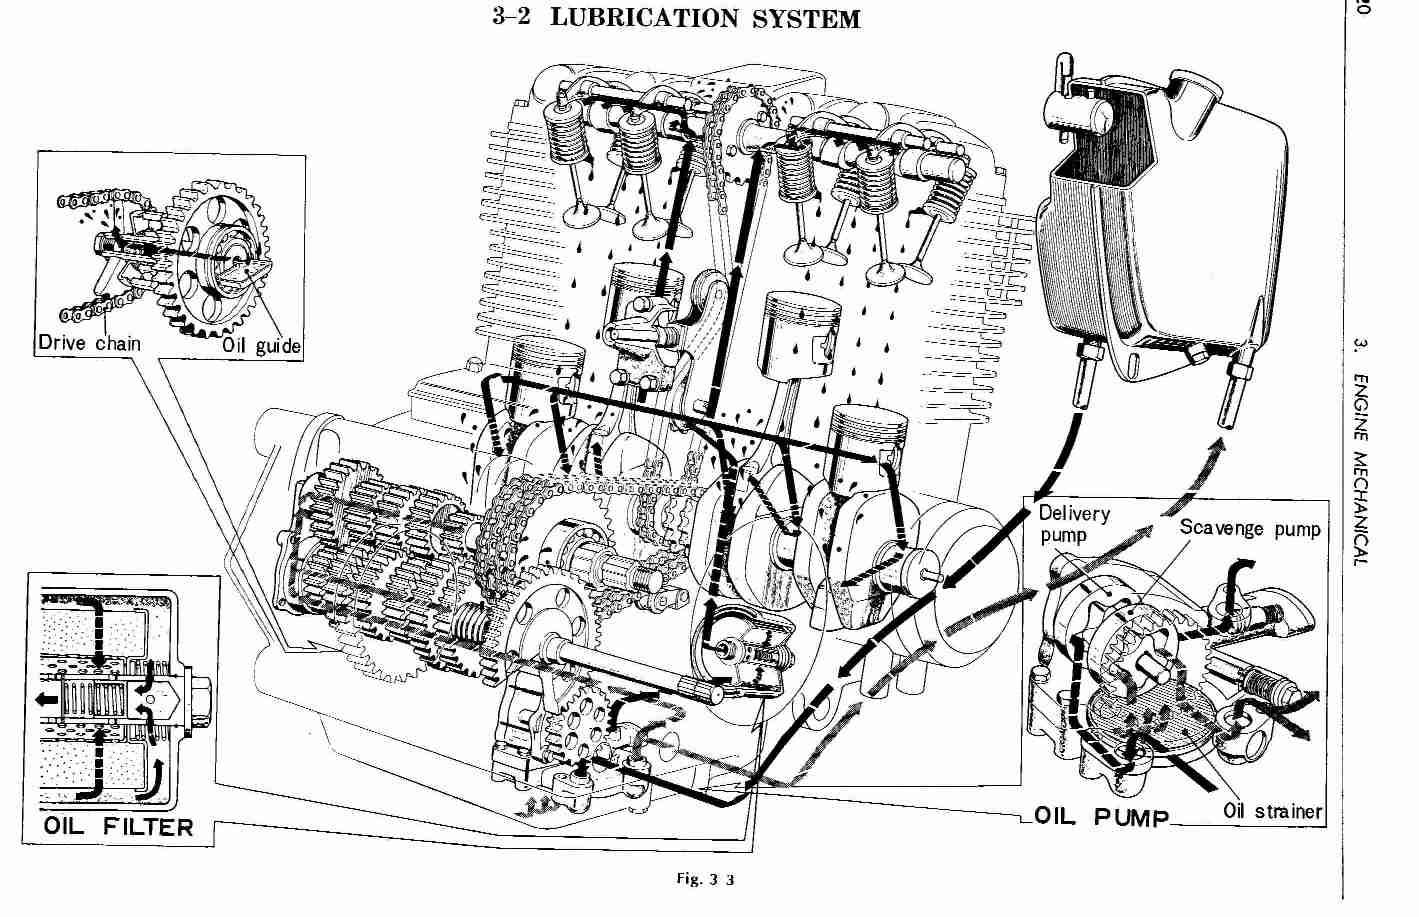 honda cb750 k2 wiring diagram rcd nz cb 750 oil flow engine pinterest and